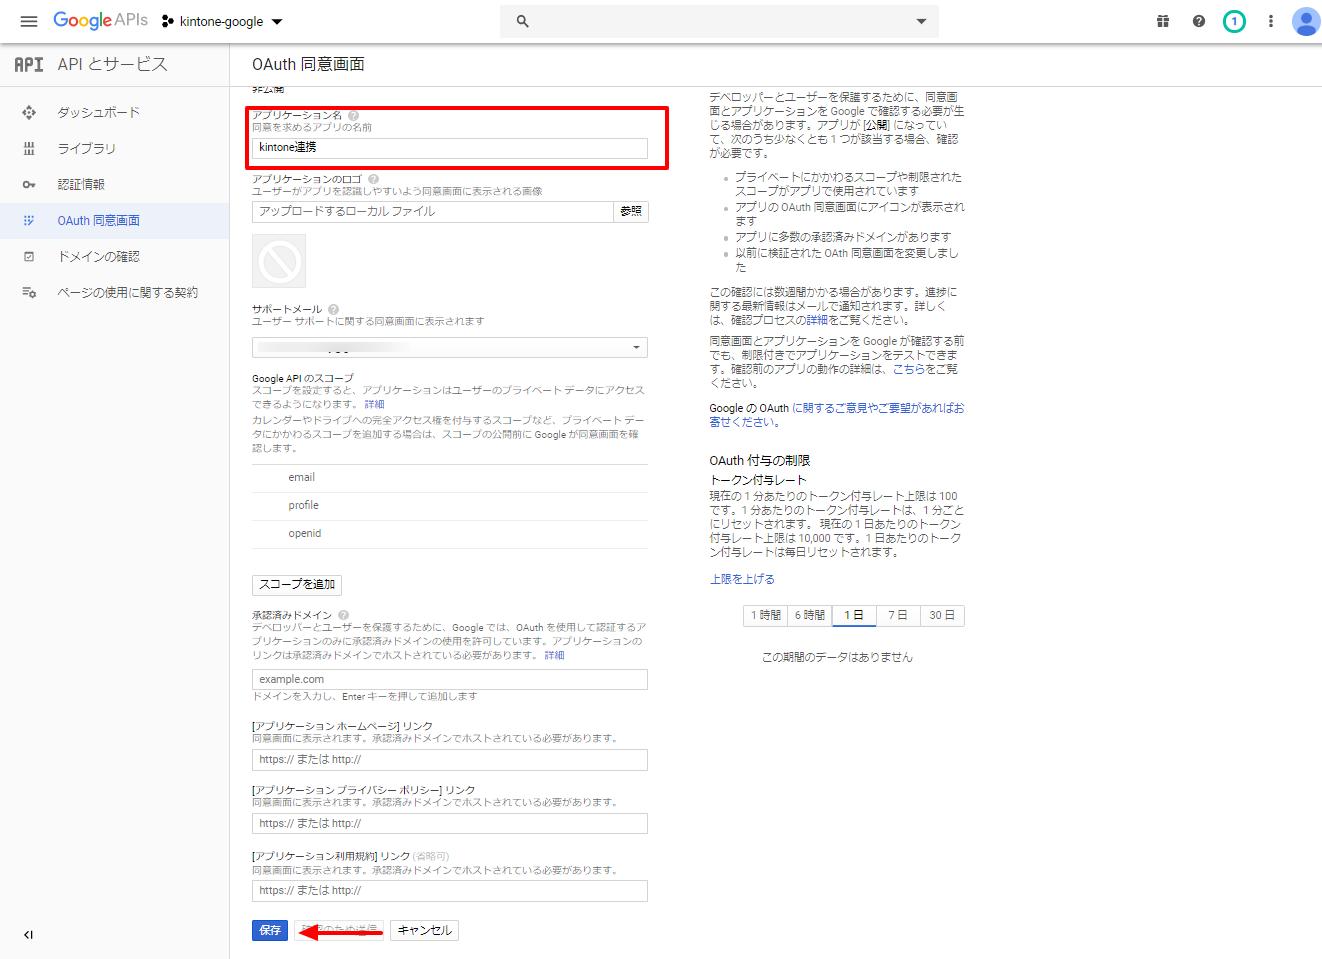 【kintone-Googleカレンダー連携プラグイン】同意画面_Google-API-コンソール